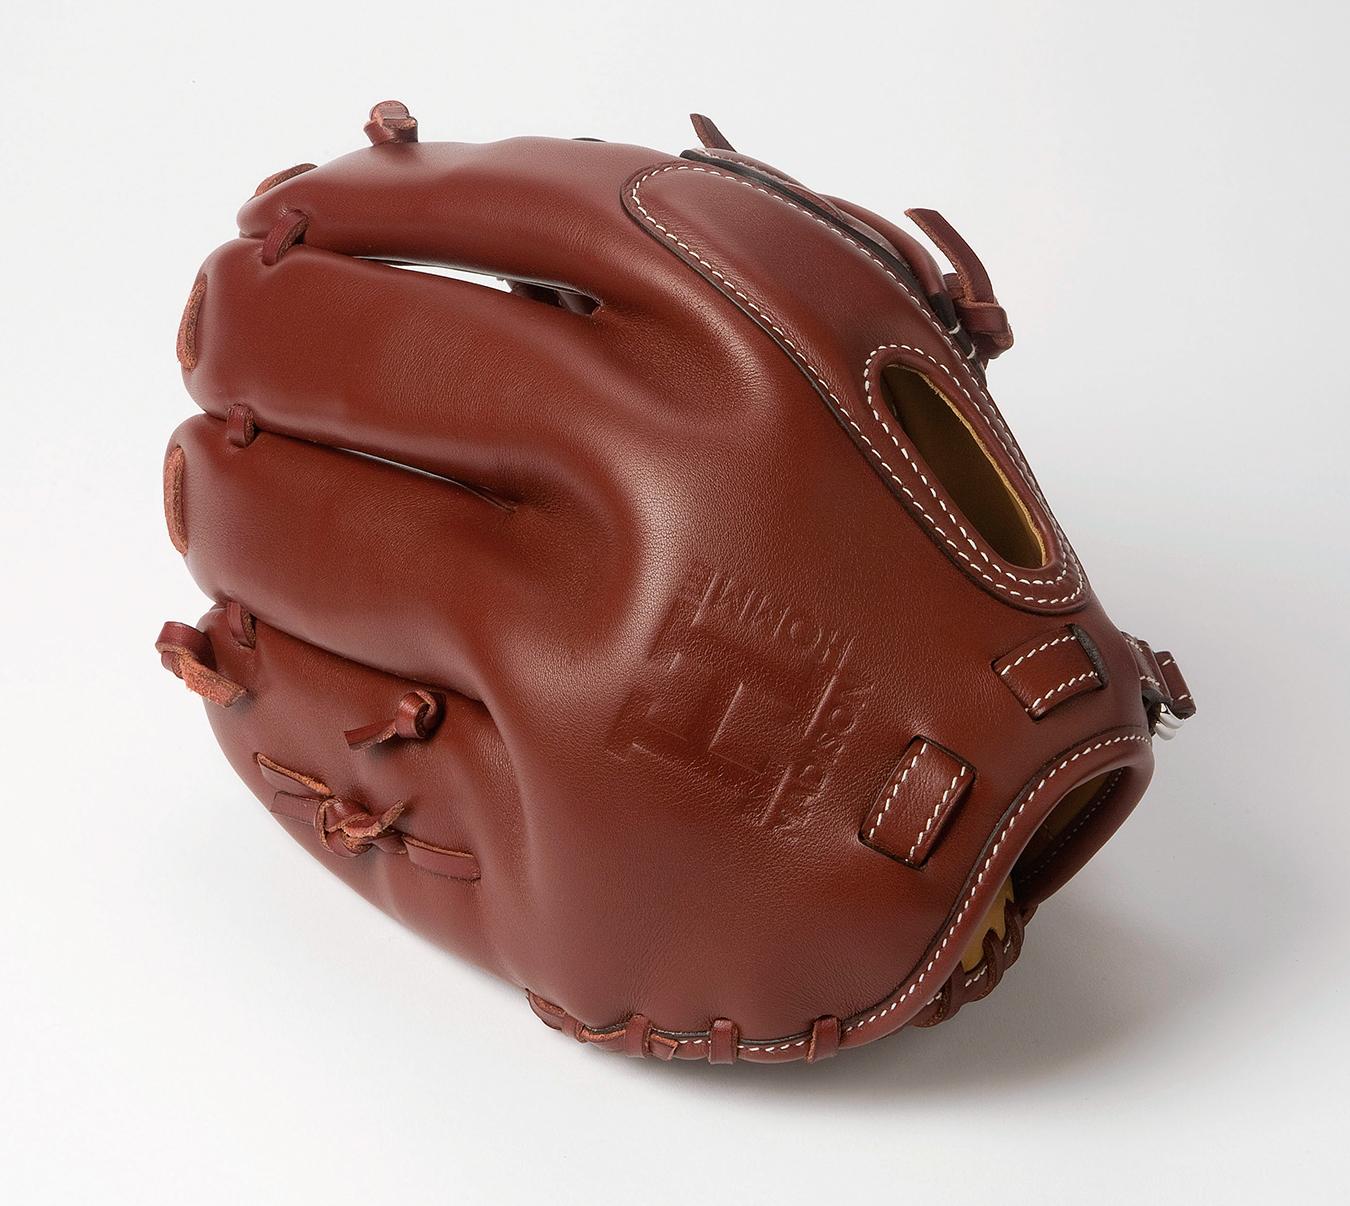 NUVO Magazine: The Hermès Baseball Glove